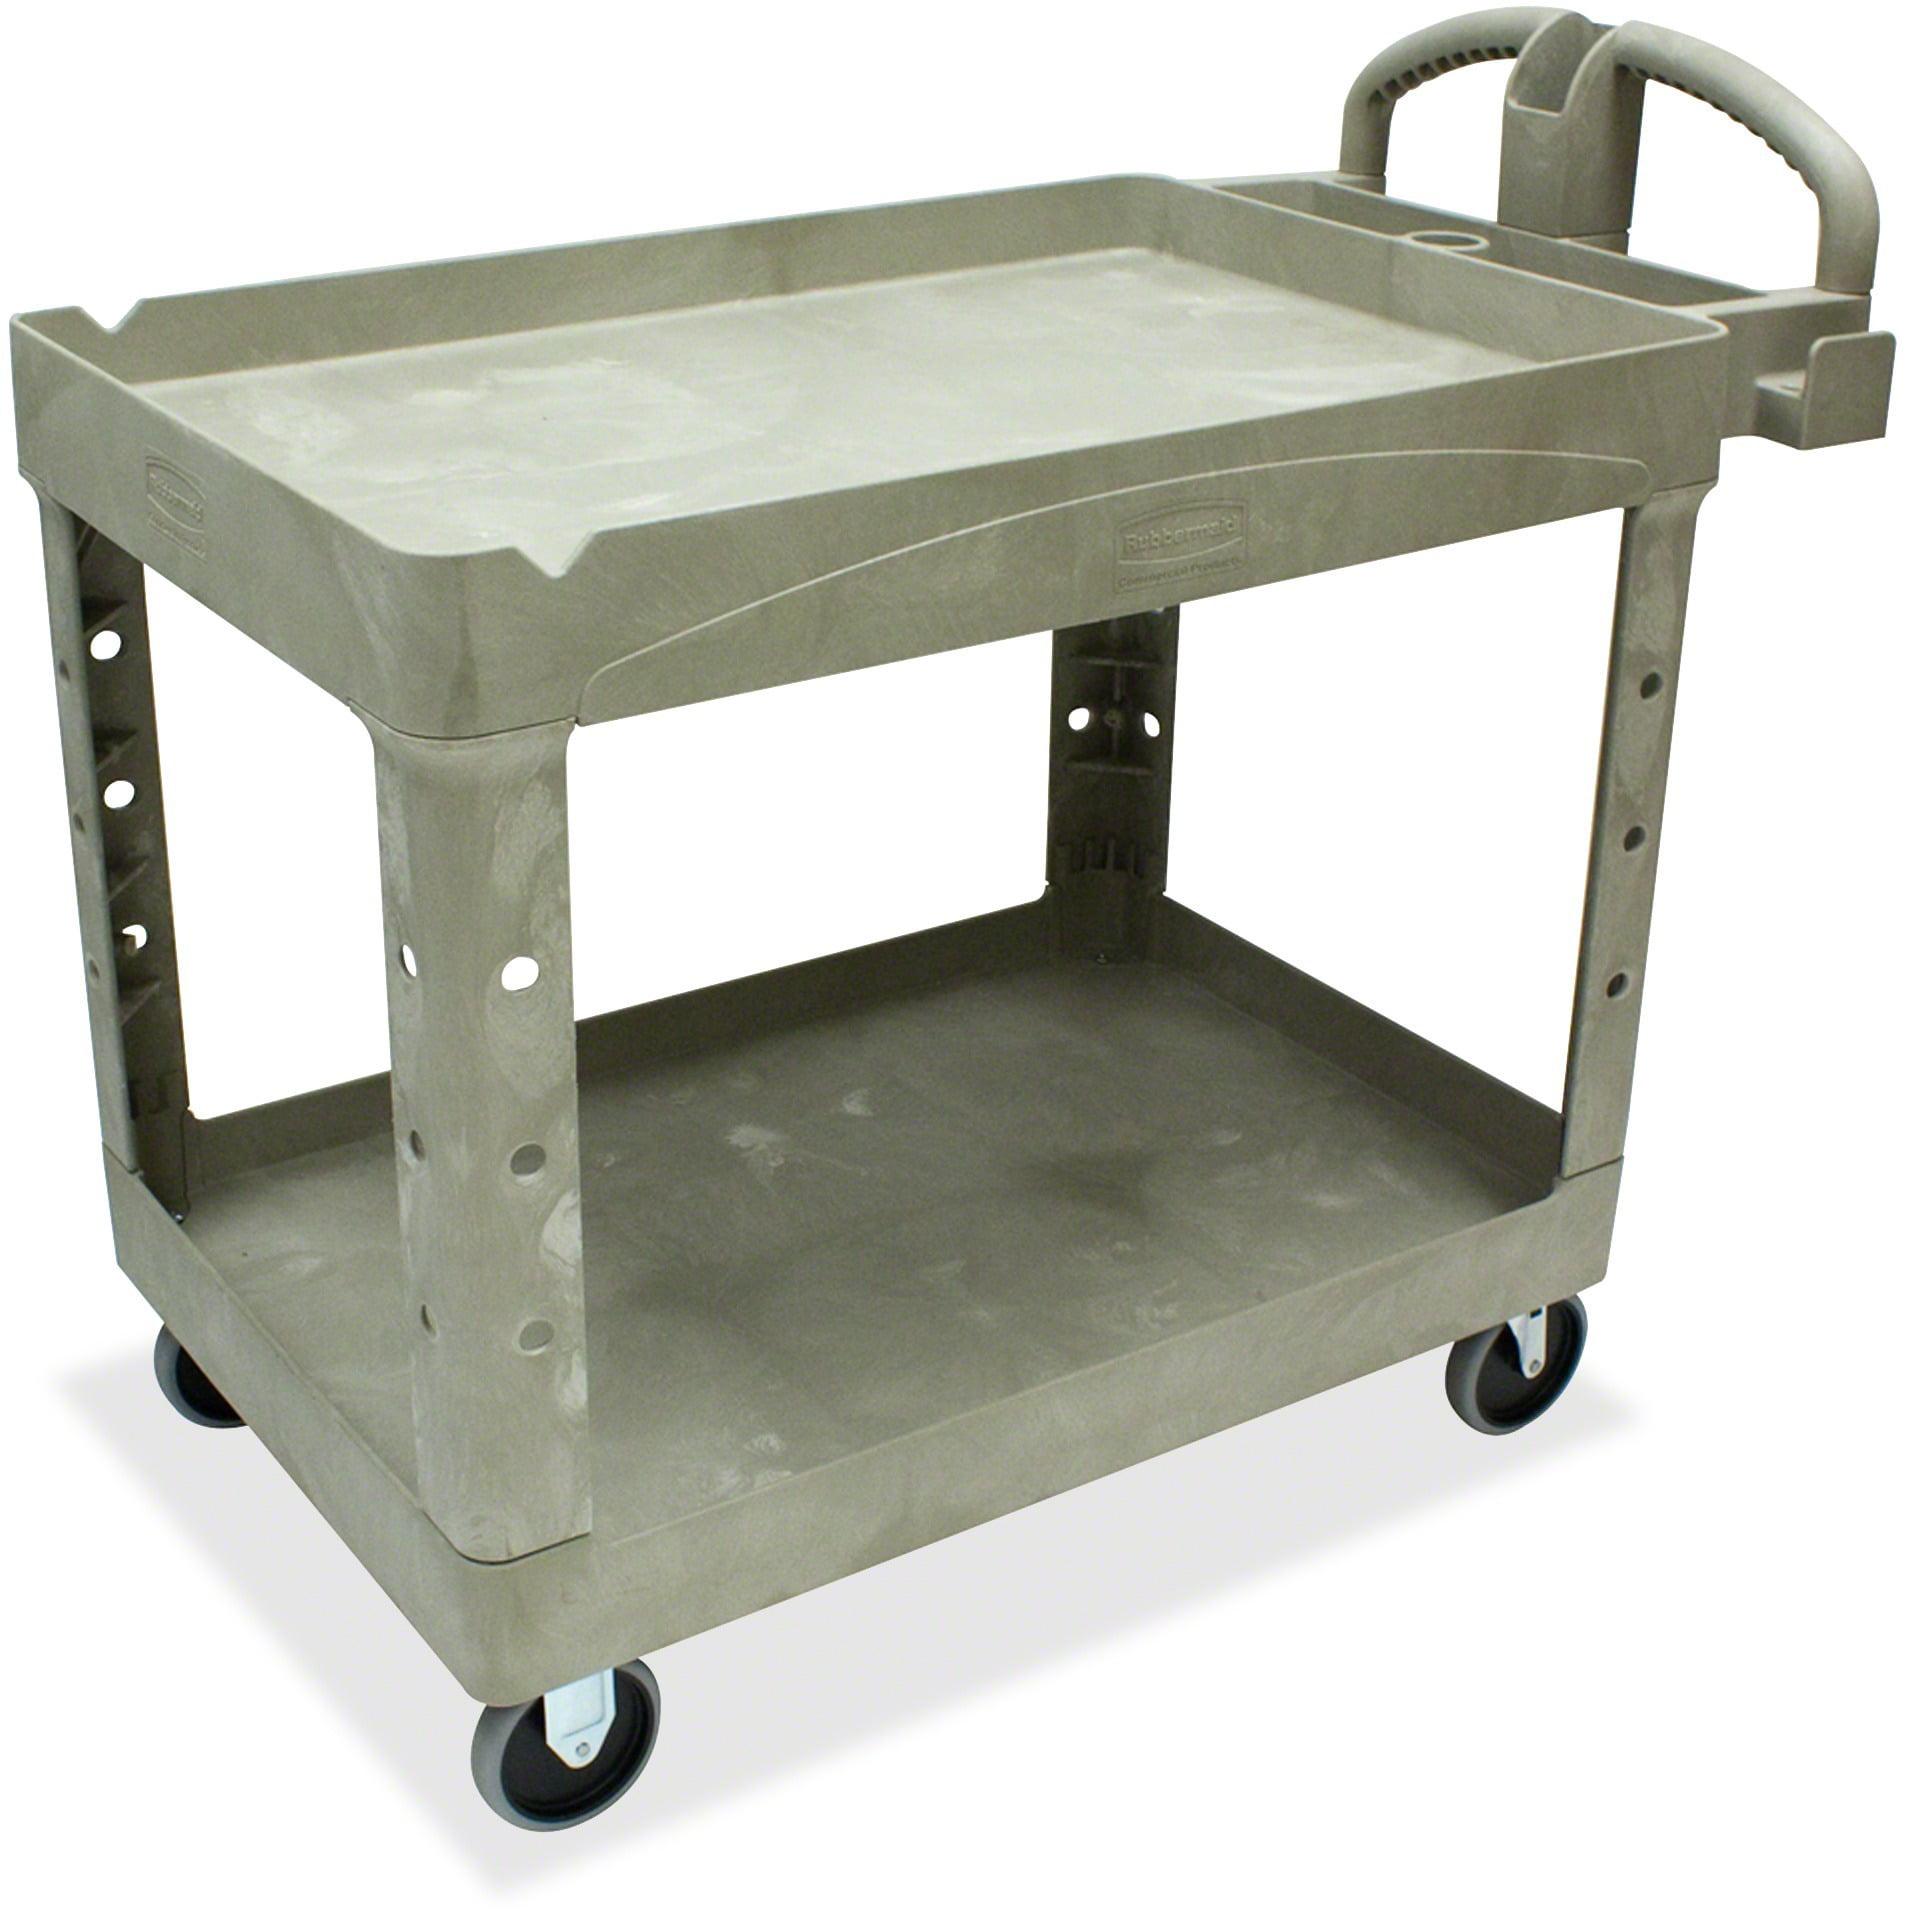 Rubbermaid Commercial, RCP452088BG, Two Shelf Service Cart, 1 Each, Beige